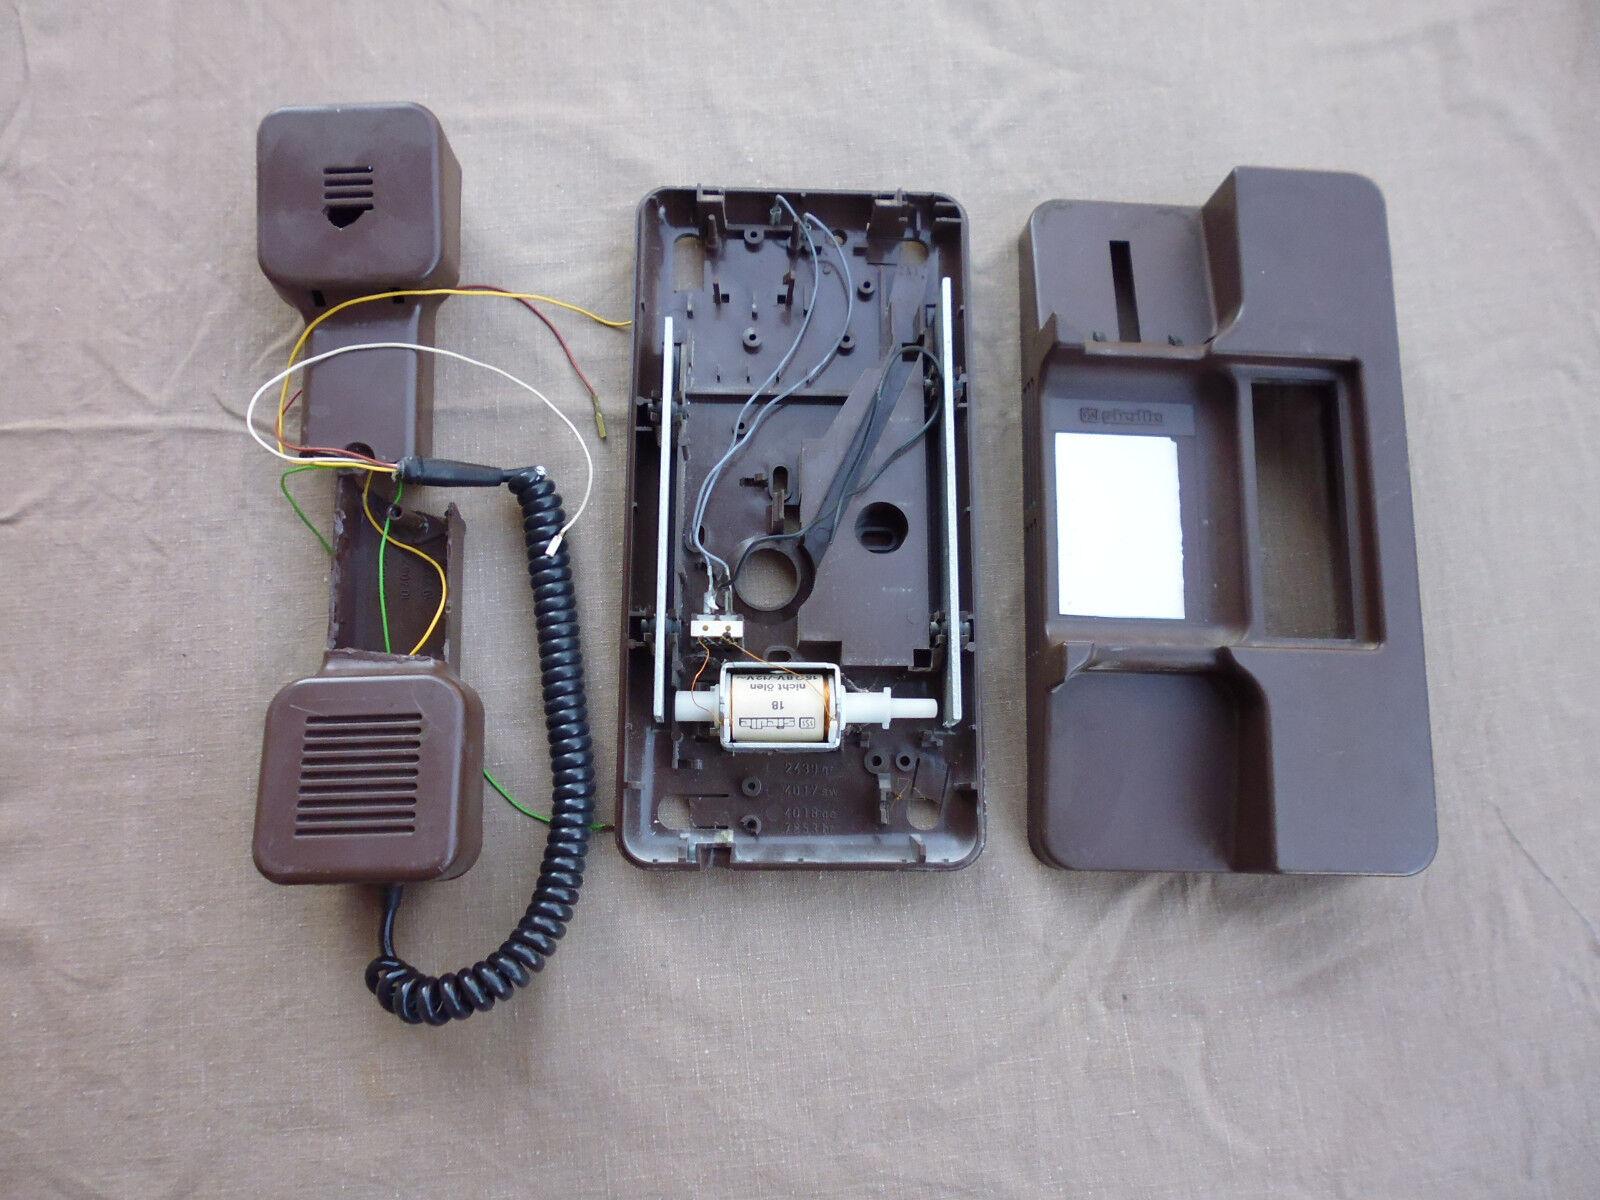 siedle mikrofon für ht311/ht351 /ht401/ht411-02